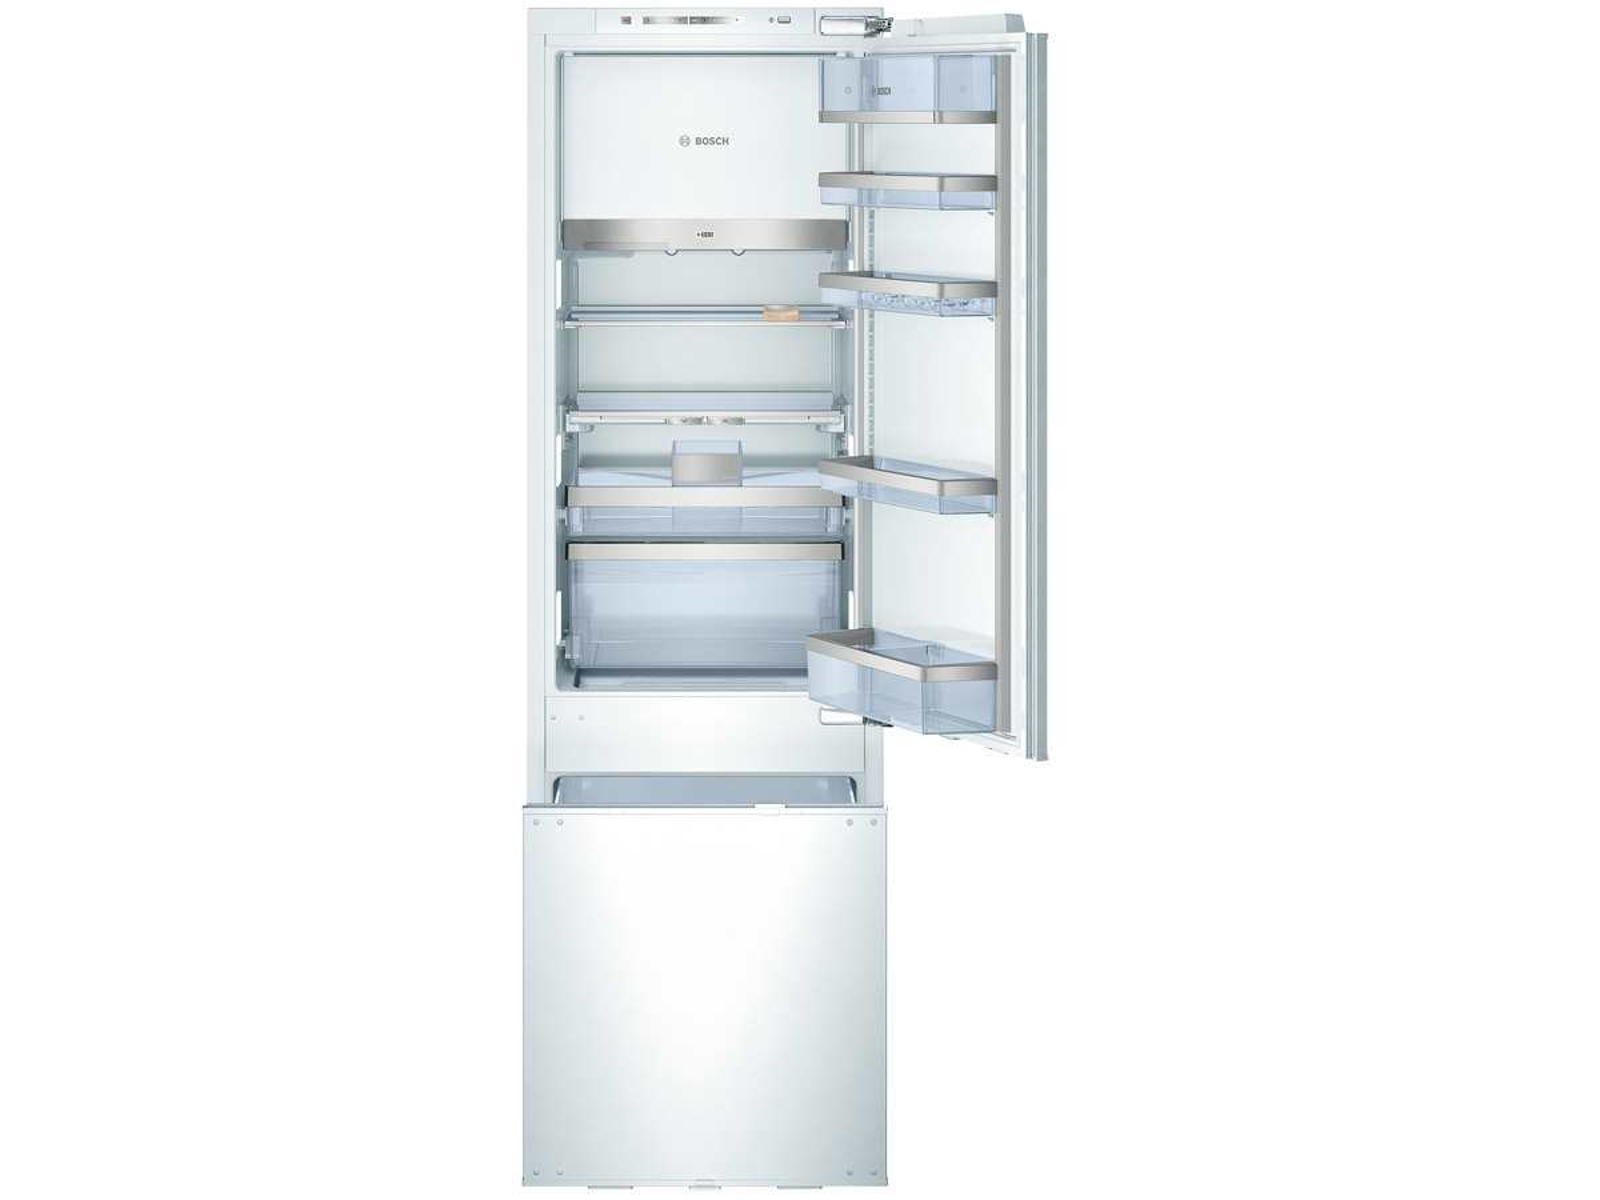 Aeg Kühlschrank Mit Kellerfach : Einbaukühlschrank cm aeg skd f einbau kühlschrank